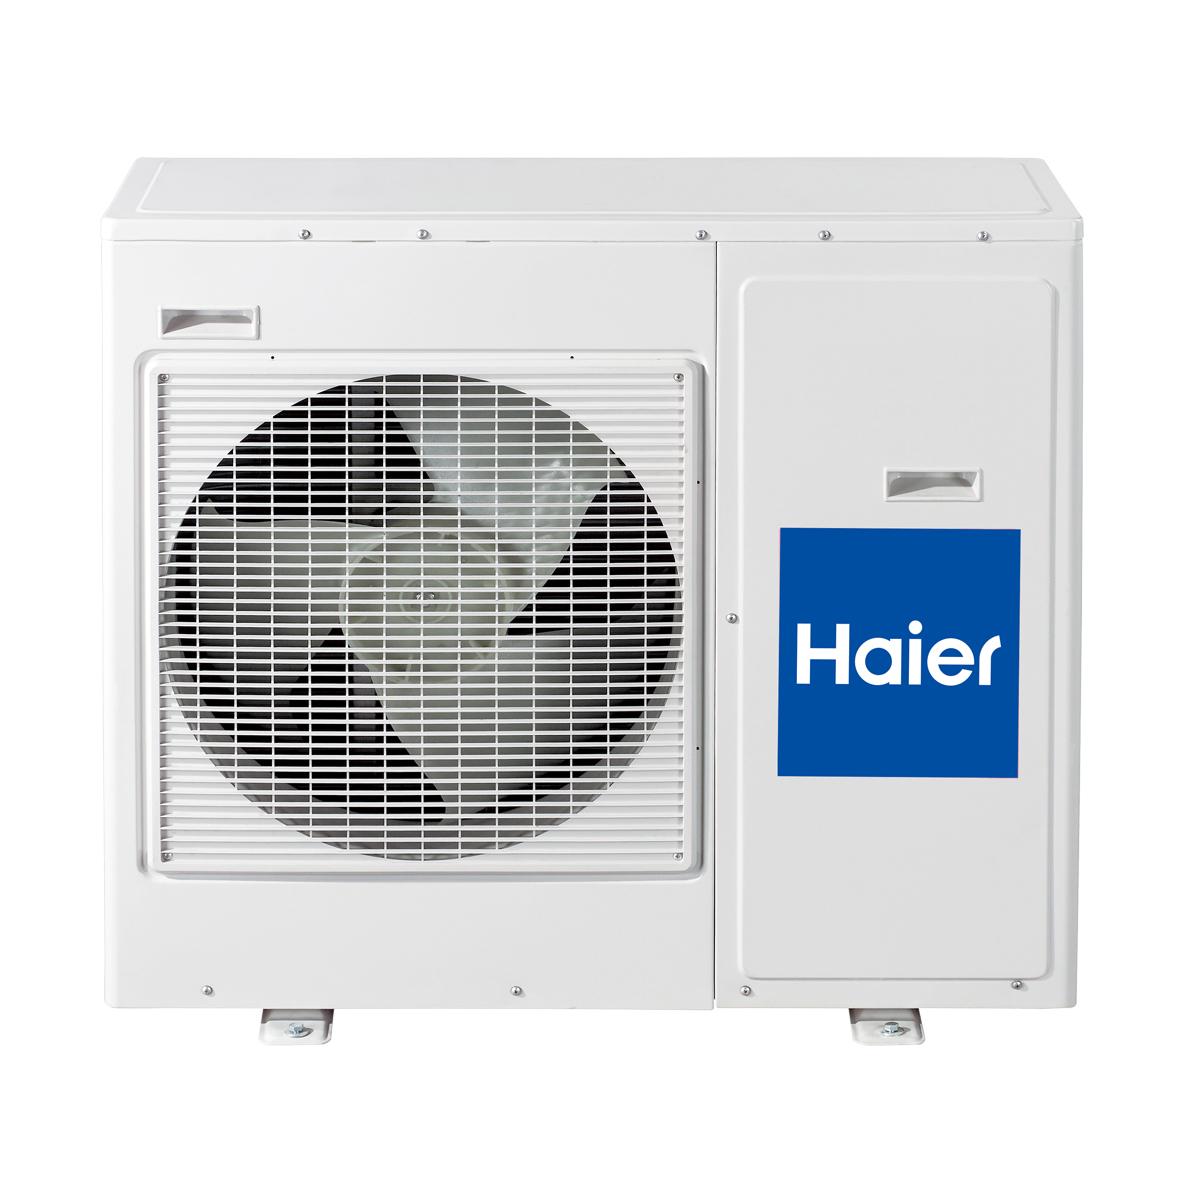 Haier aire acondicionado for Aire acondicionado haier